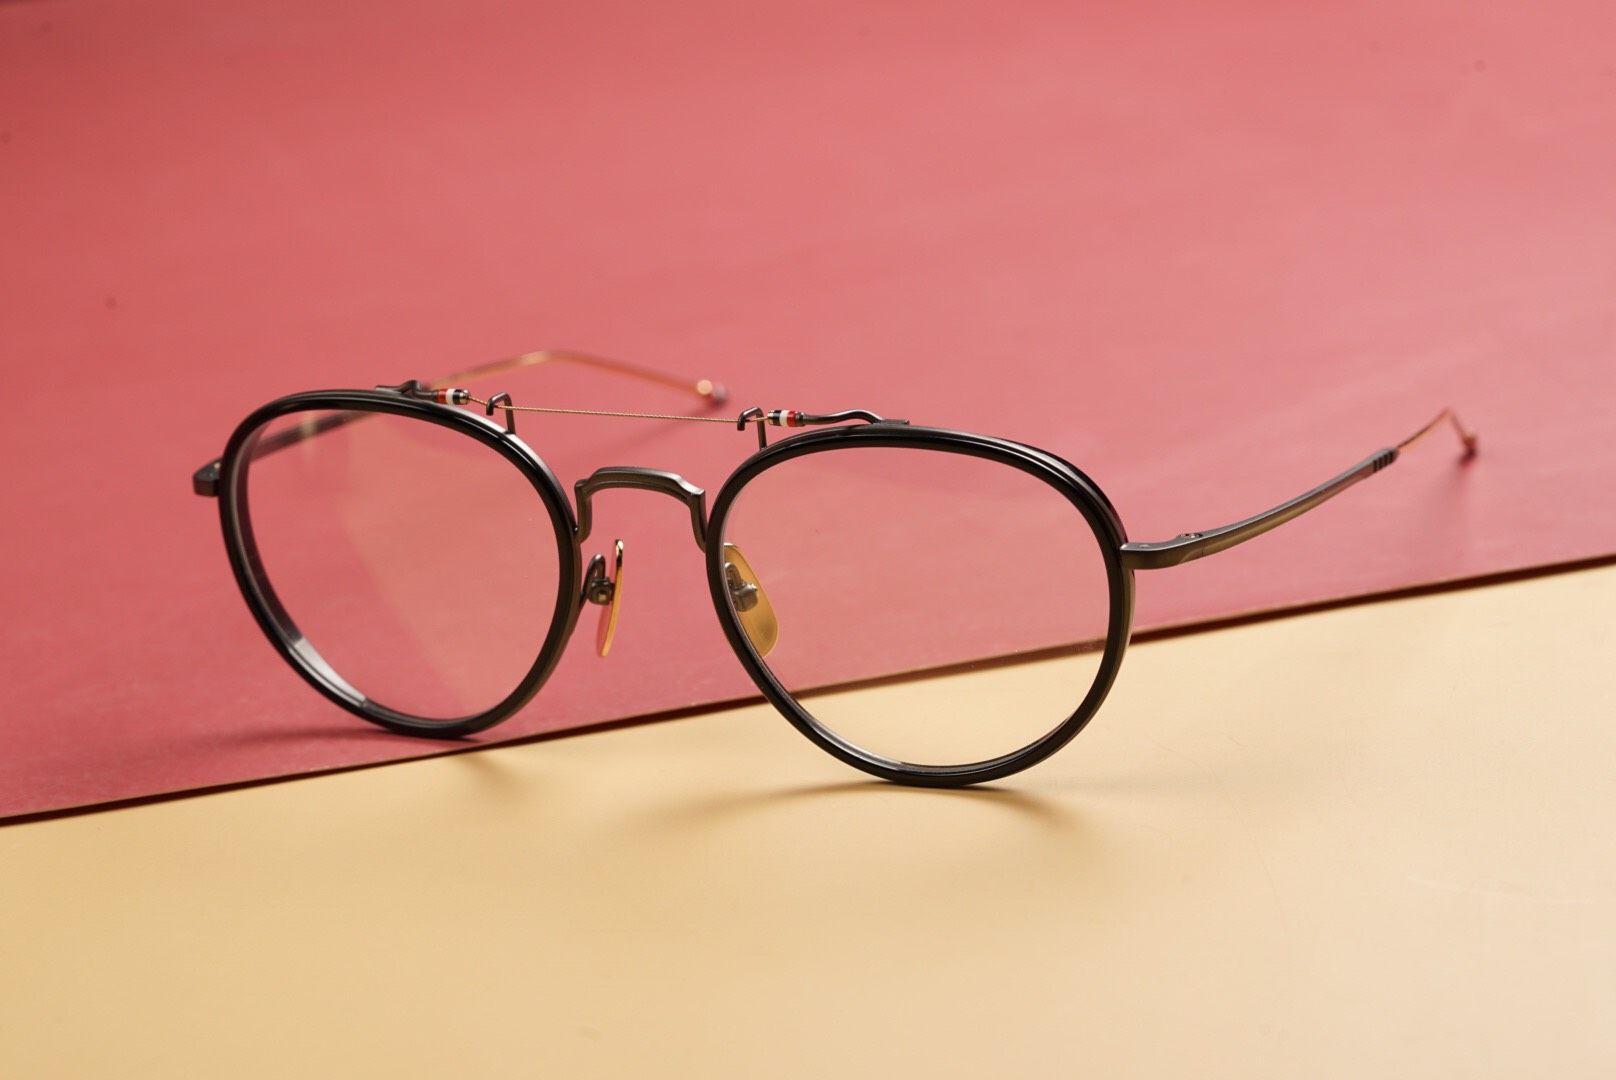 TB815 - Black Pantos Sunglasses